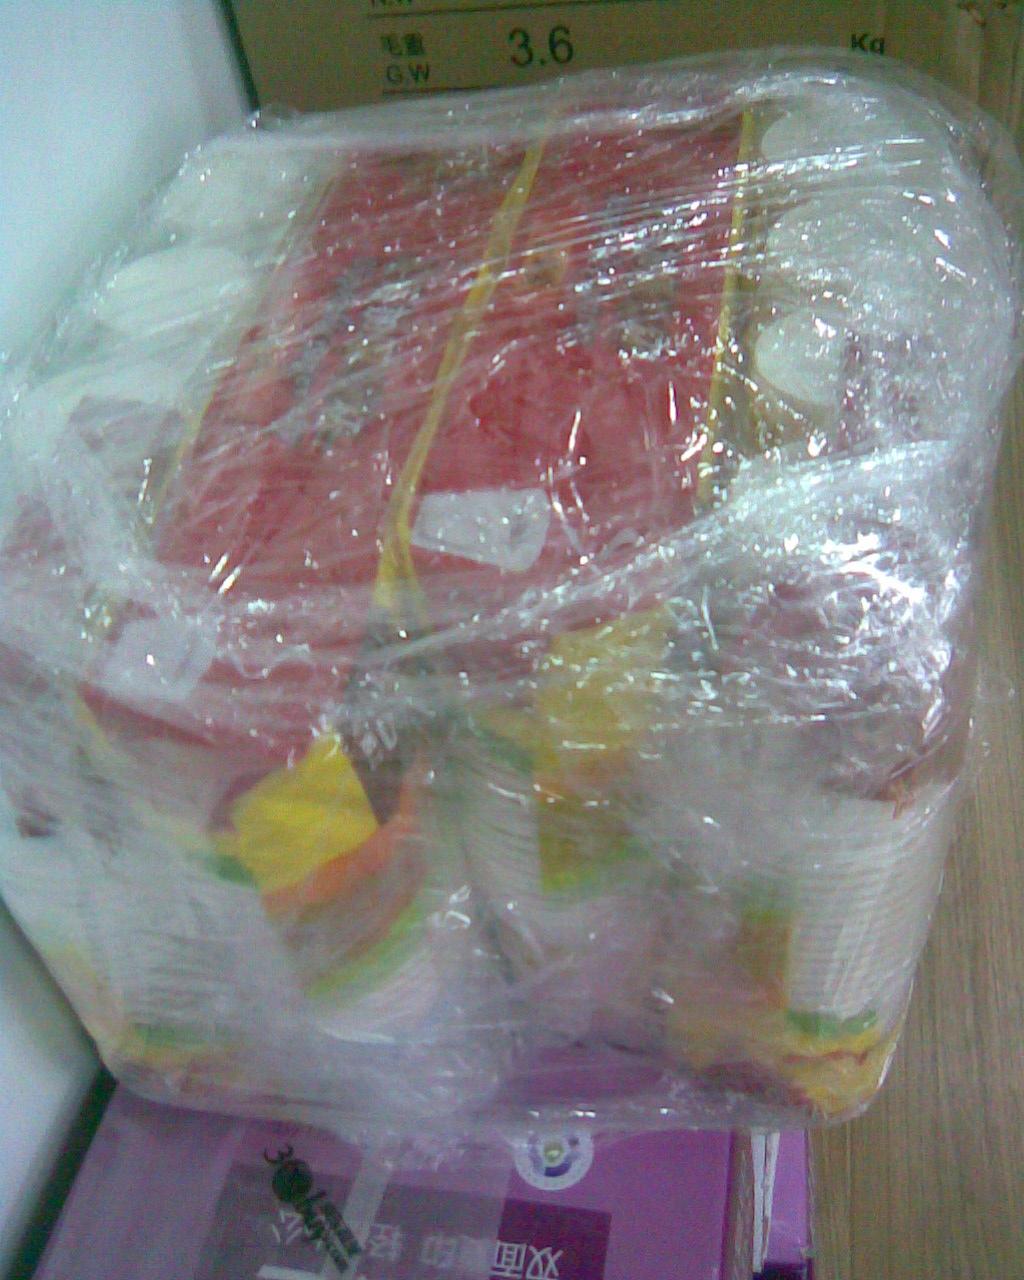 cheap chrome hearts sunglasses 2015 fashion tips 00291724 bags